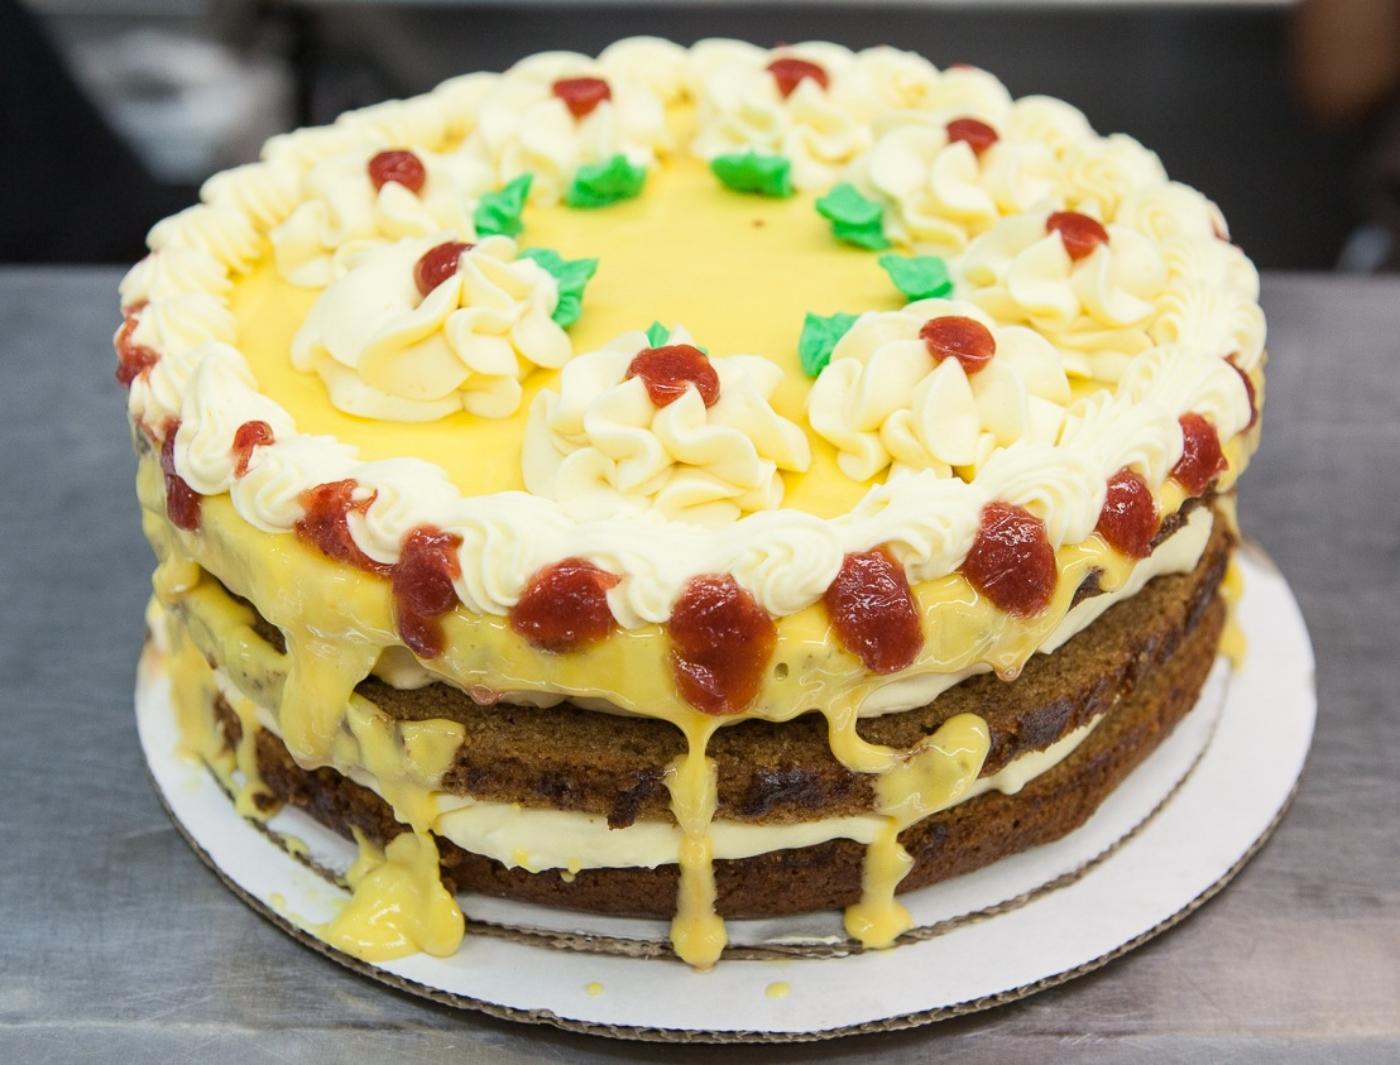 fresh-baked-yellow-cake-mana-foods-bakery.jpg